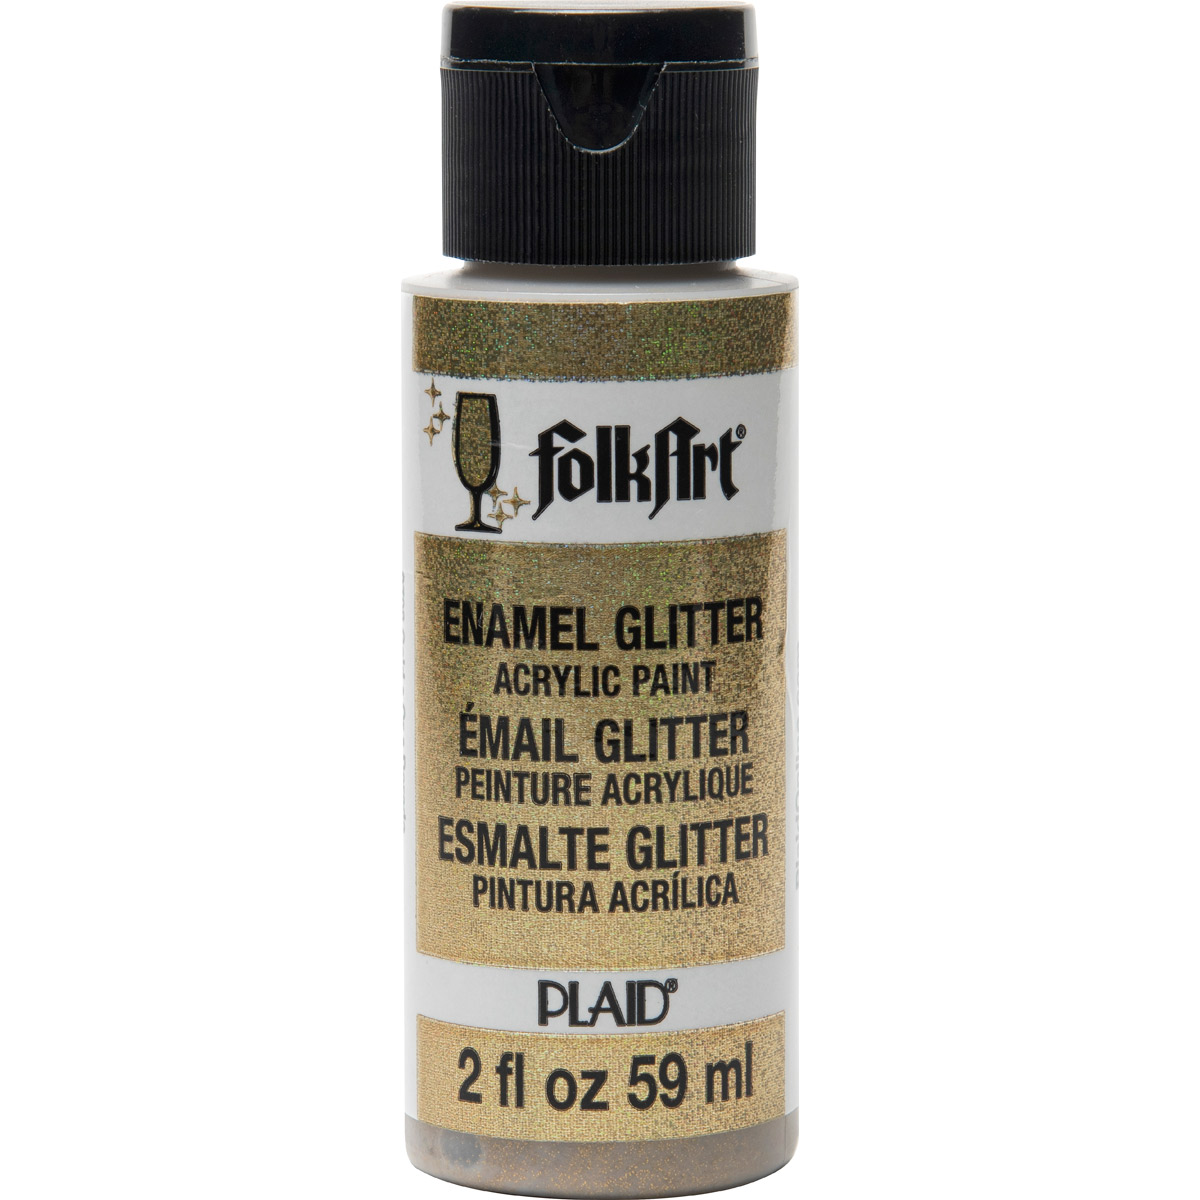 FolkArt ® Enamels™ - Glitter Gold, 2 oz. - 2798